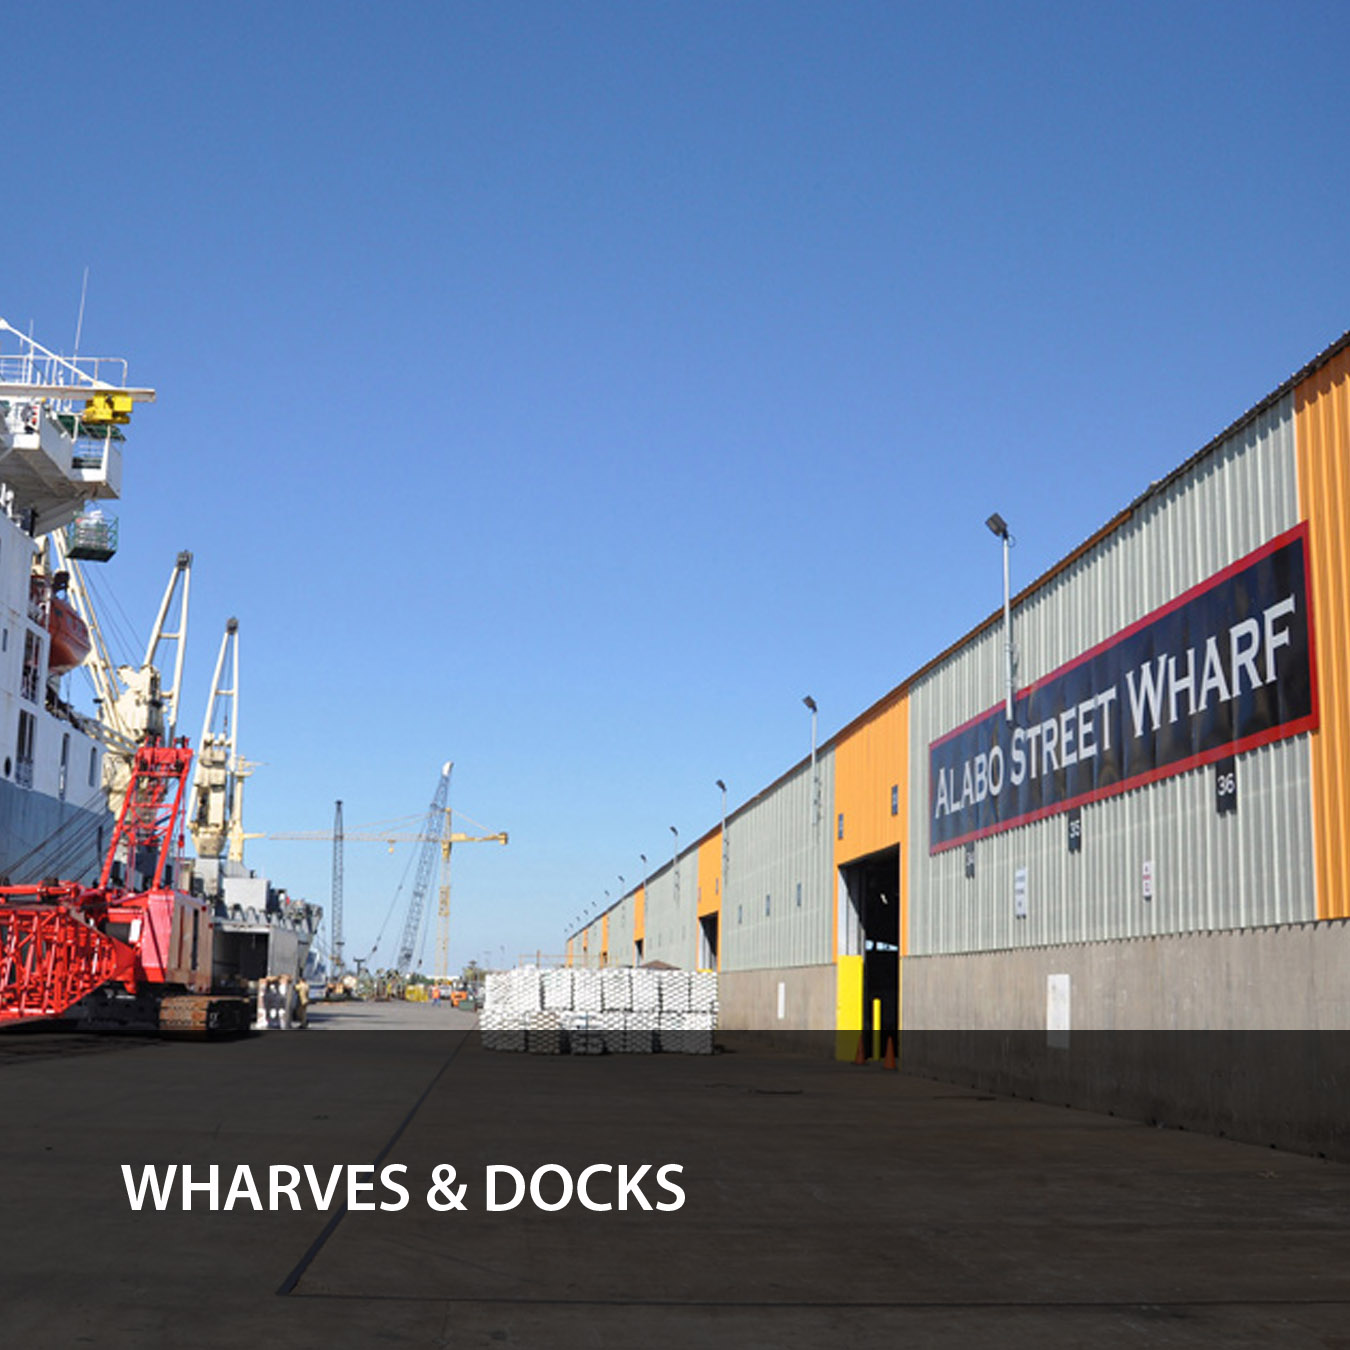 Wharves & Docks